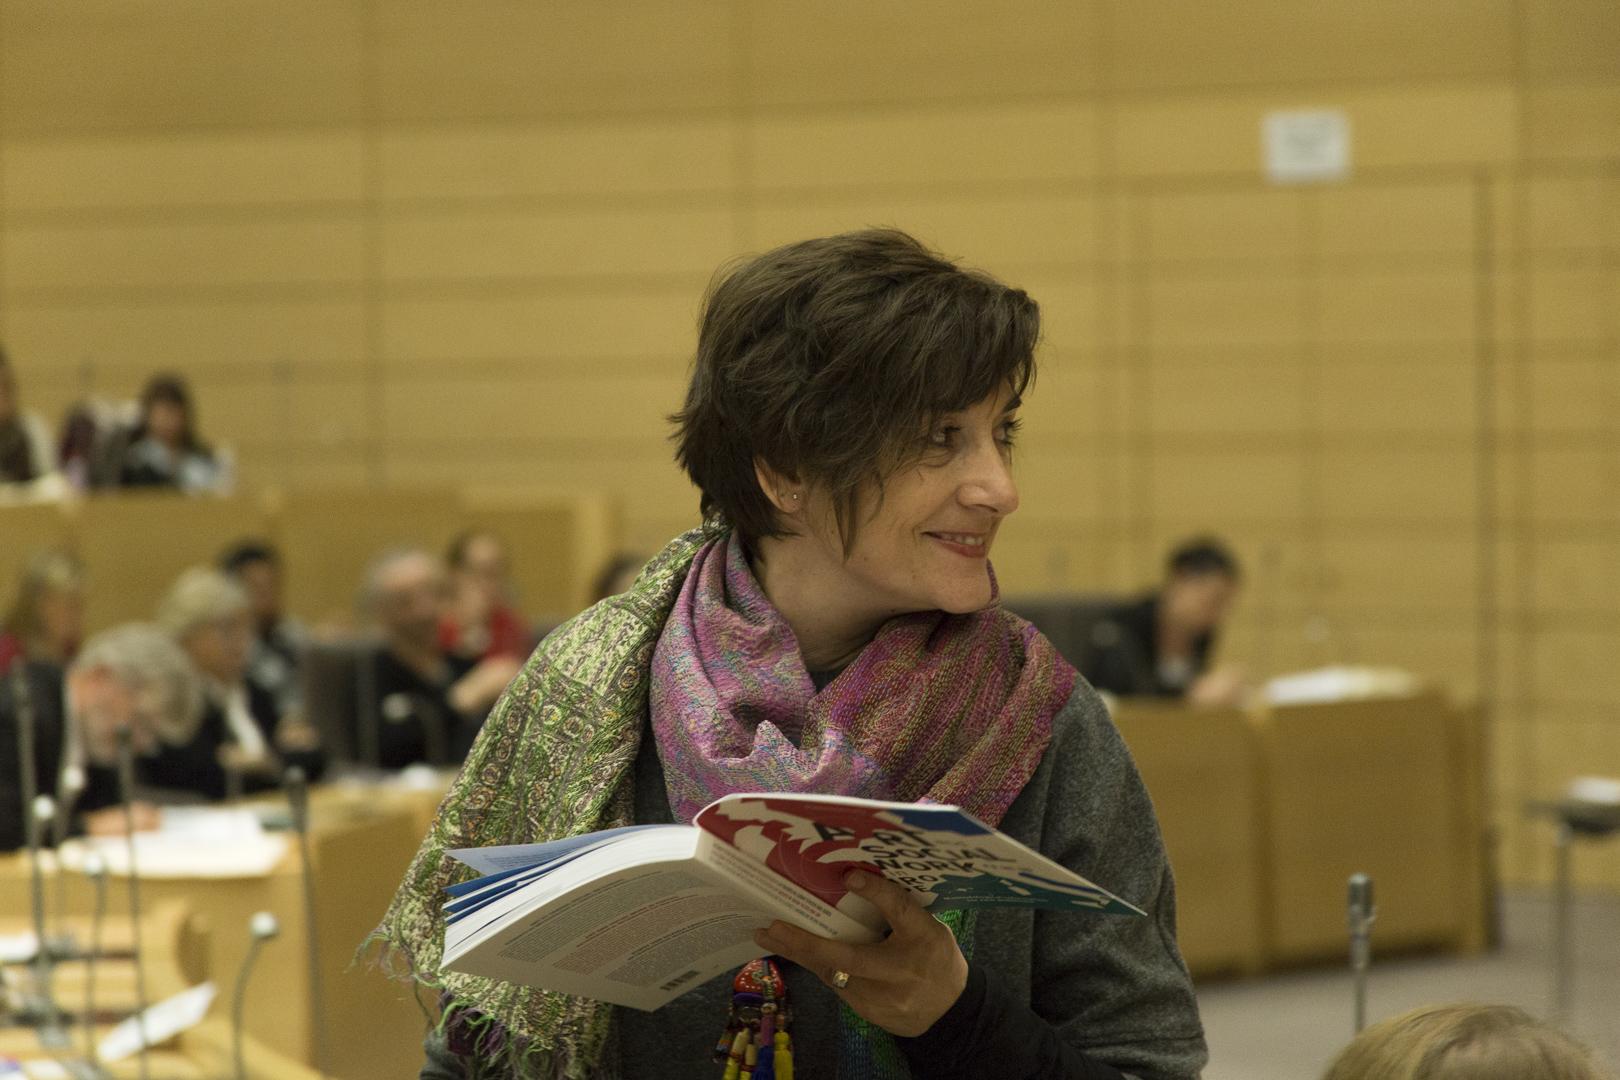 Colloque Européen - Latitudes_WEB - Camille Graule